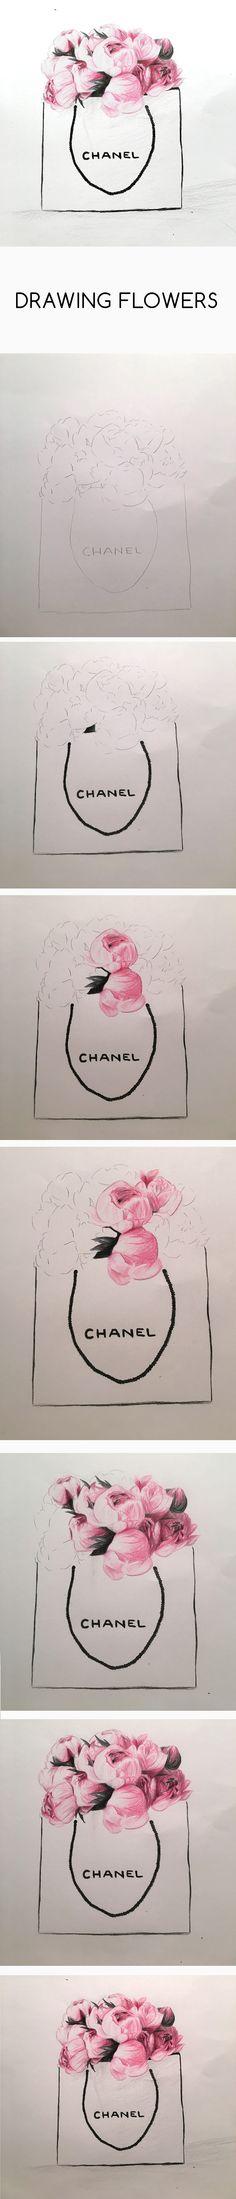 Drawing Flowers peonies pink chanel bag tutorial step by step